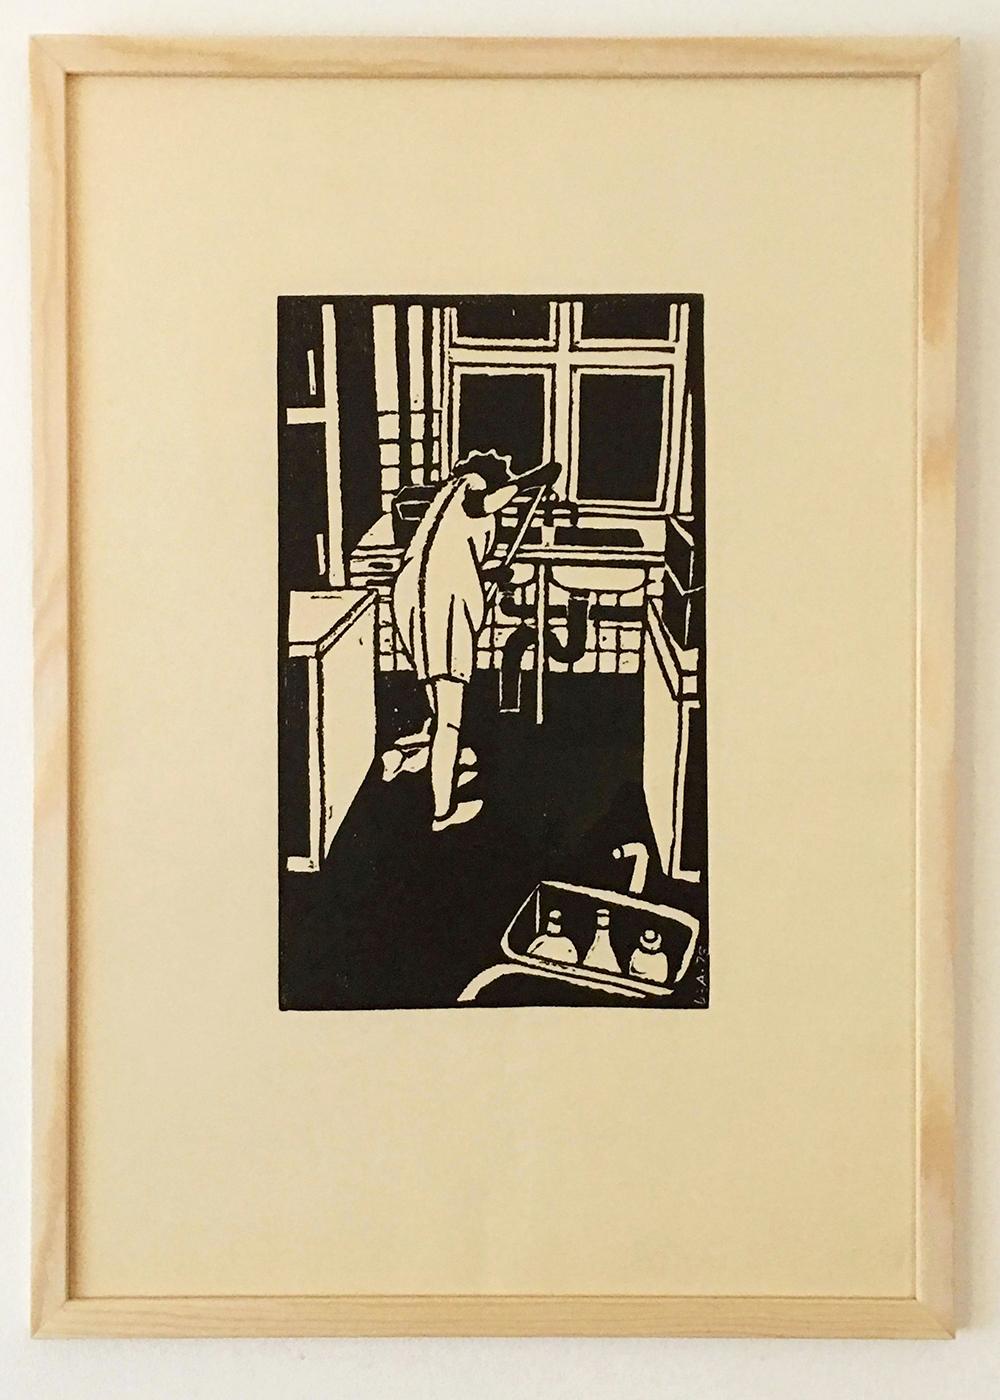 "Dea Trier Mørch ""Tidlig morgen i køkkenet - Baska"", 1976"